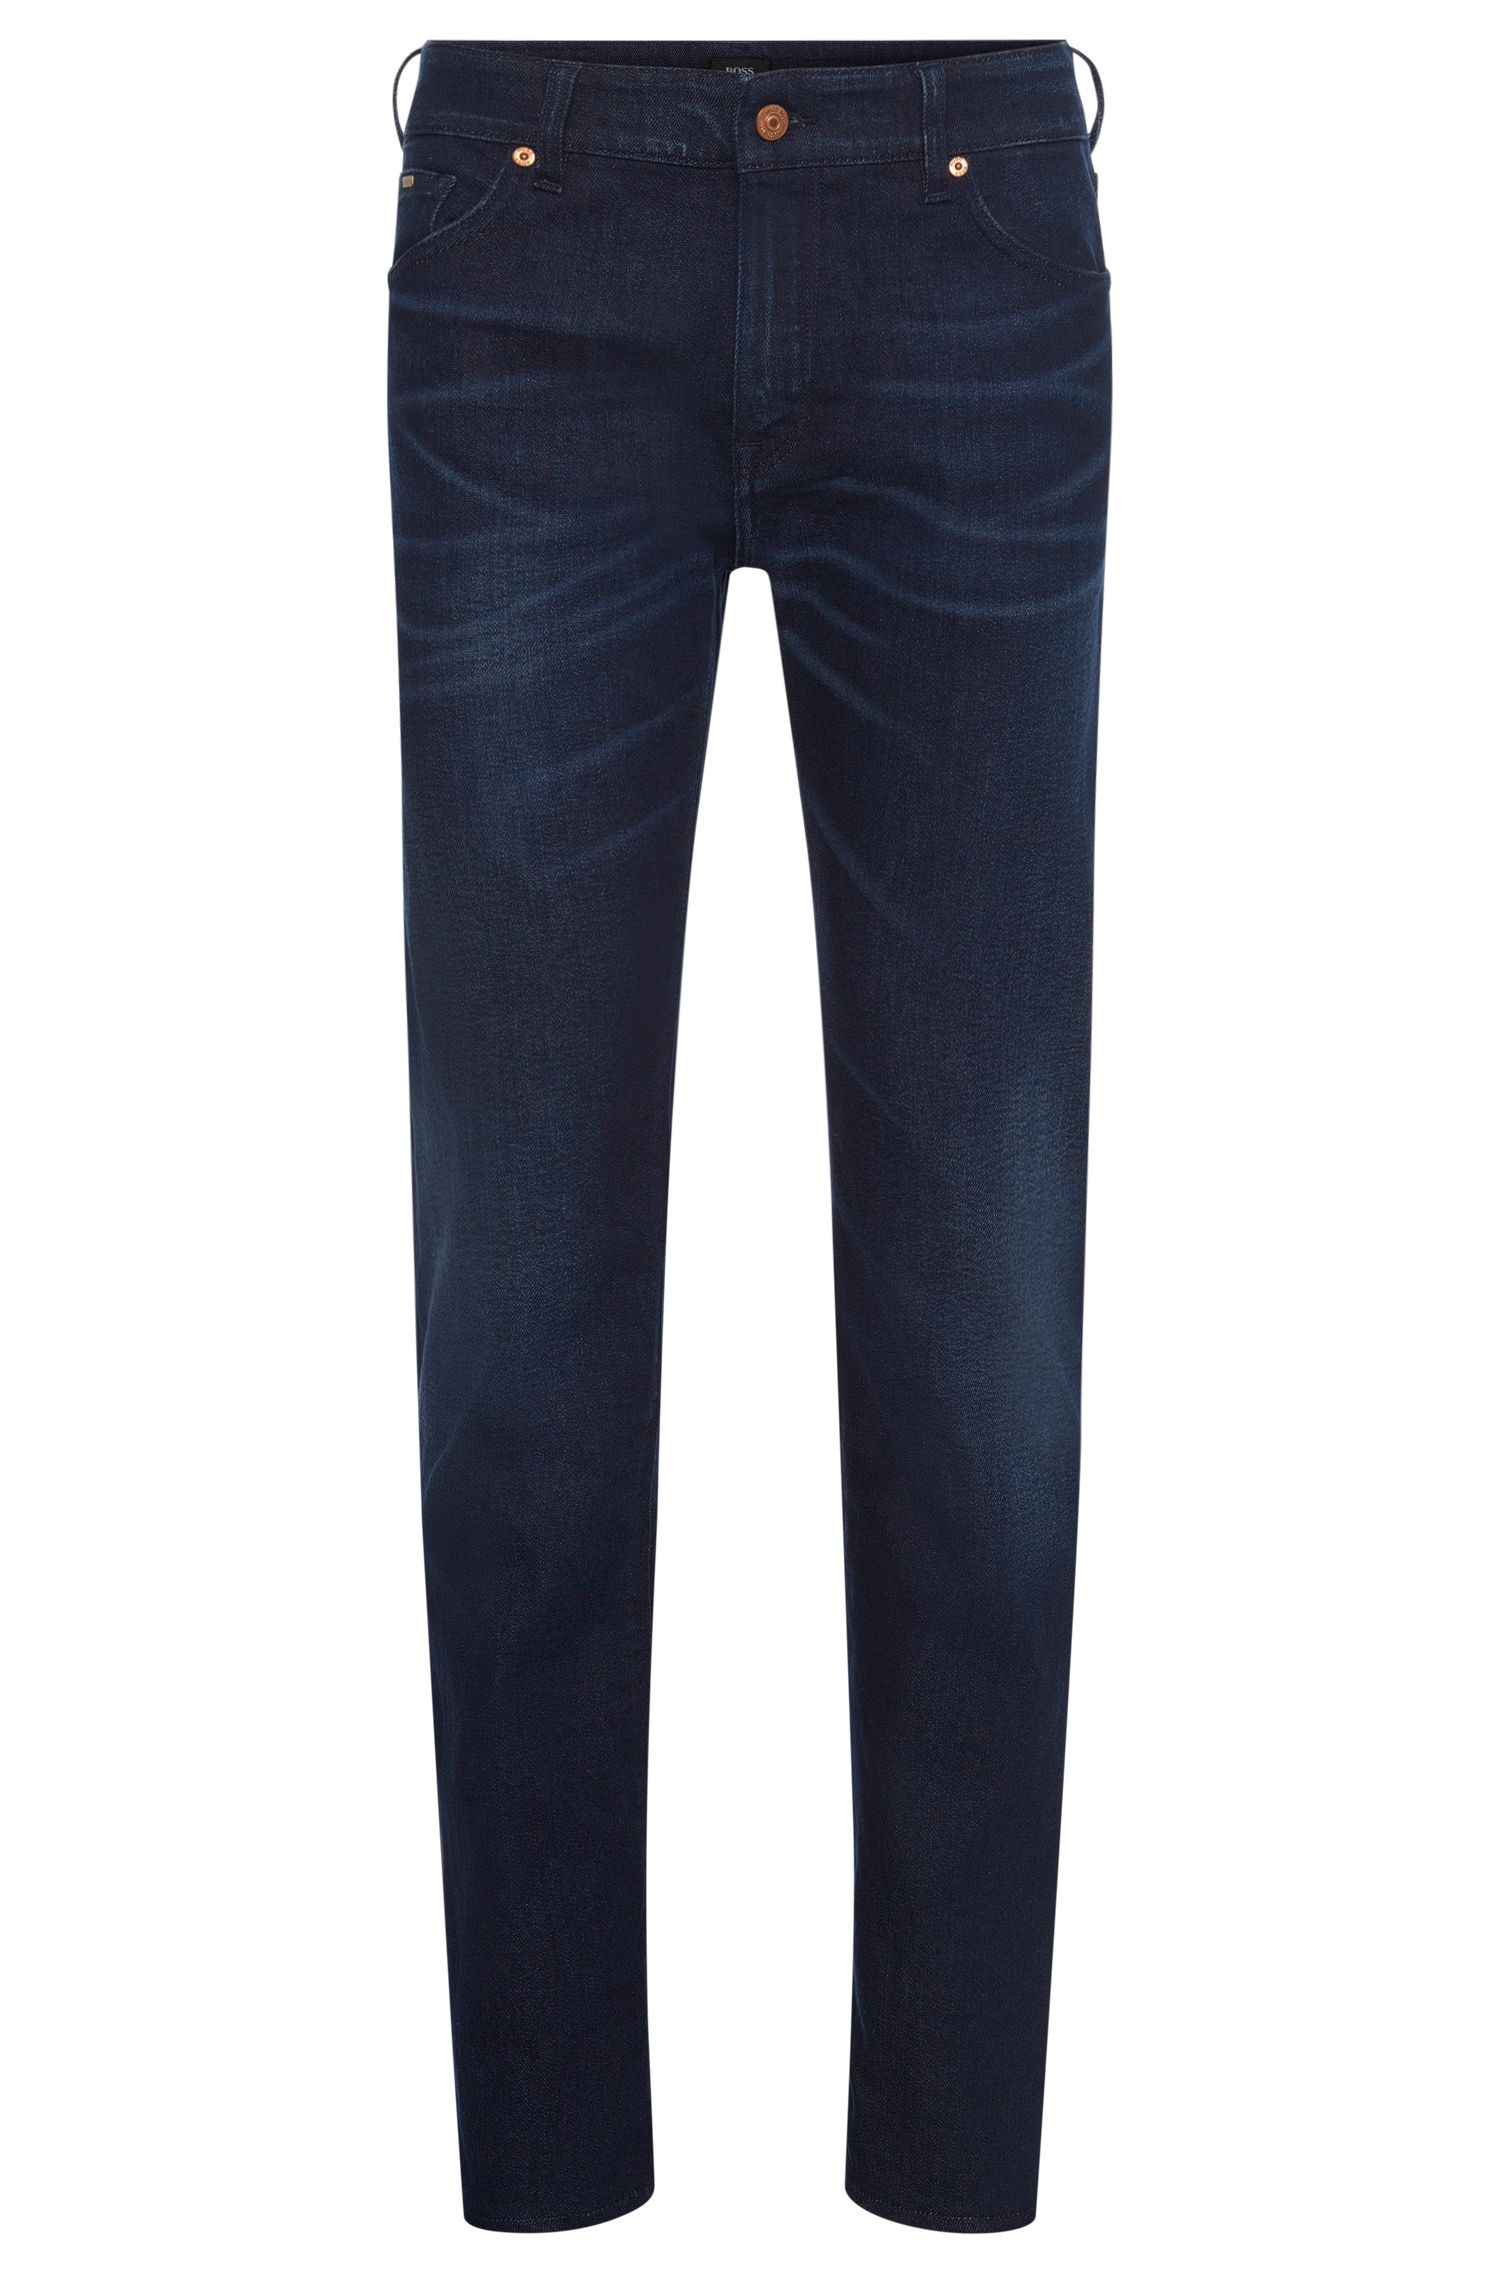 11.5 oz Stretch Cotton Blend Jeans, Regular Fit | Maine, Blue